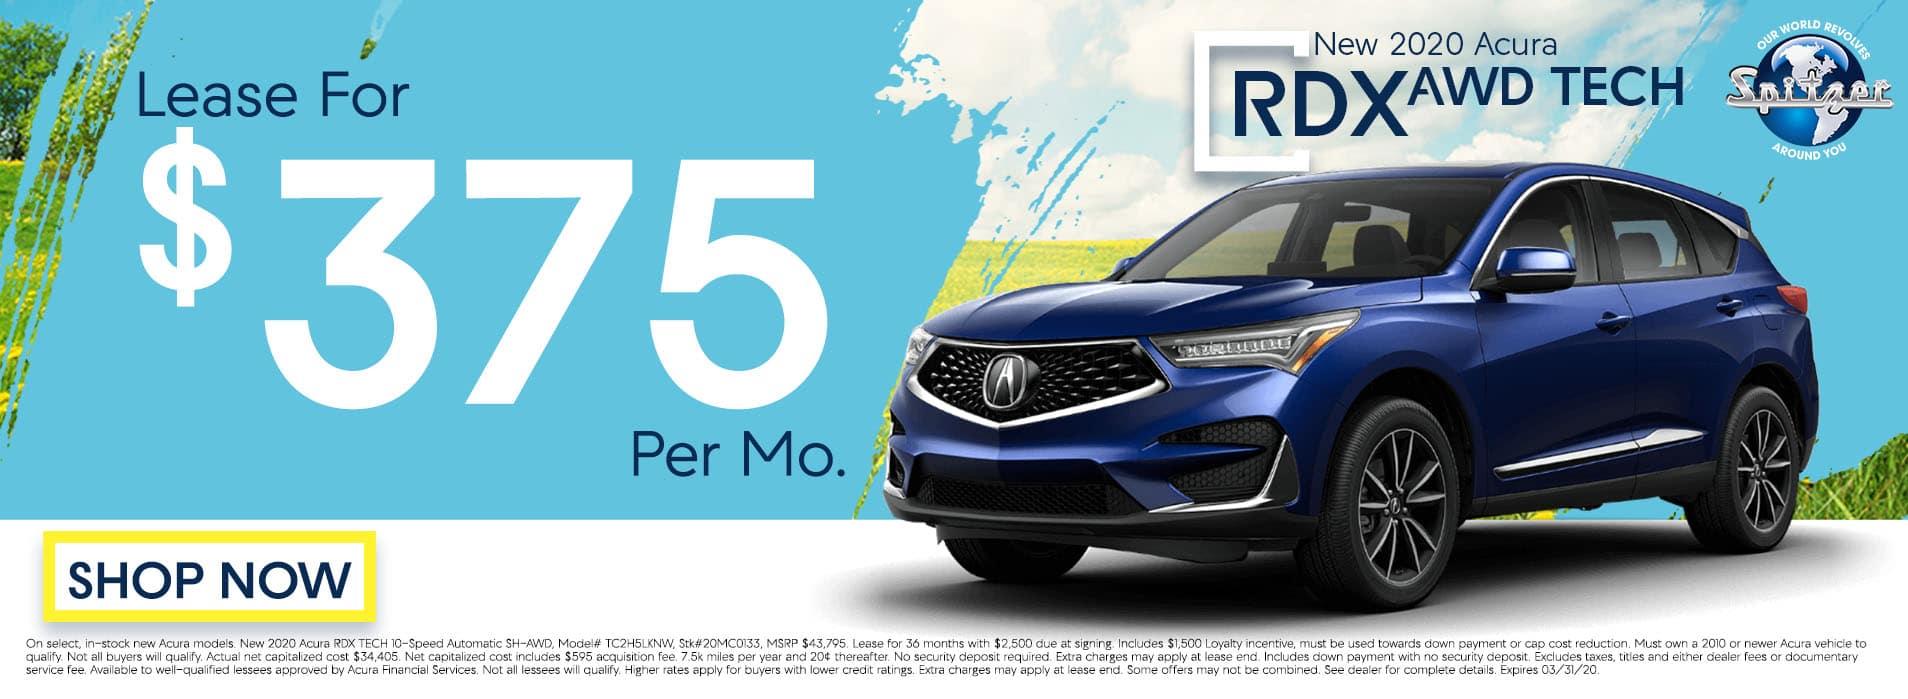 RDX | Lease for $375 per mo